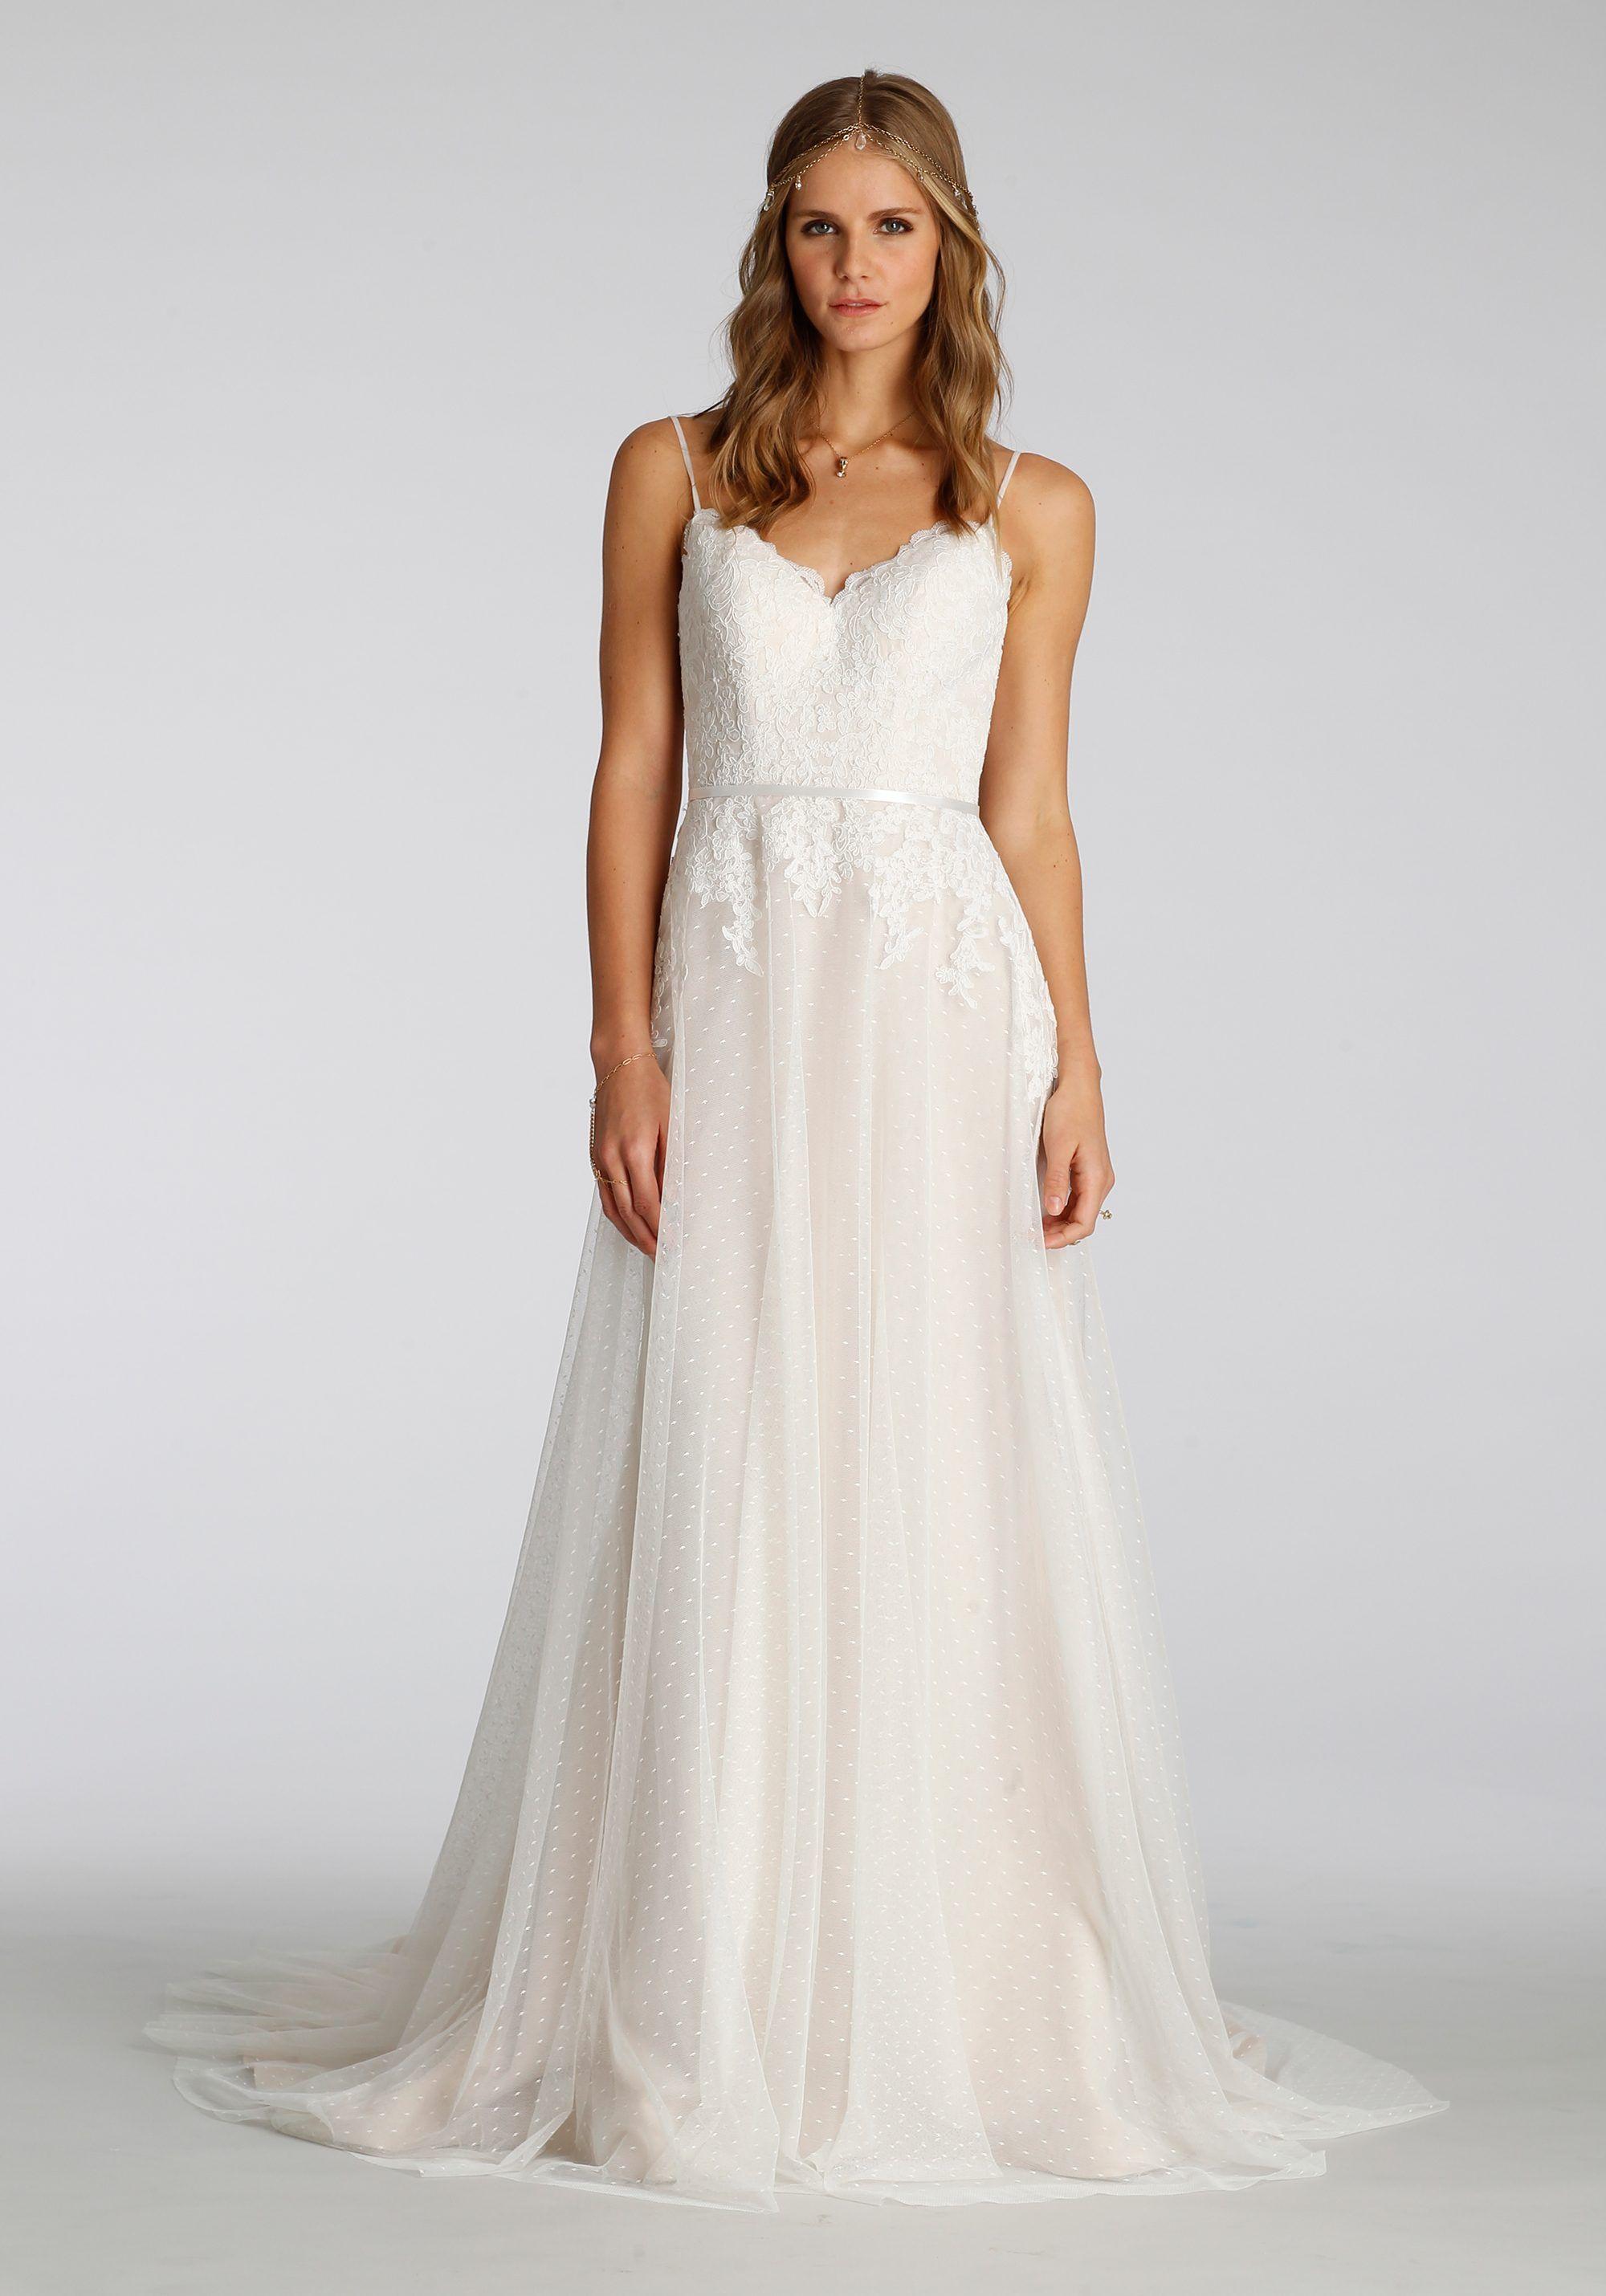 c265d3c540 Jlm Couture Wedding Dresses Prices - Gomes Weine AG